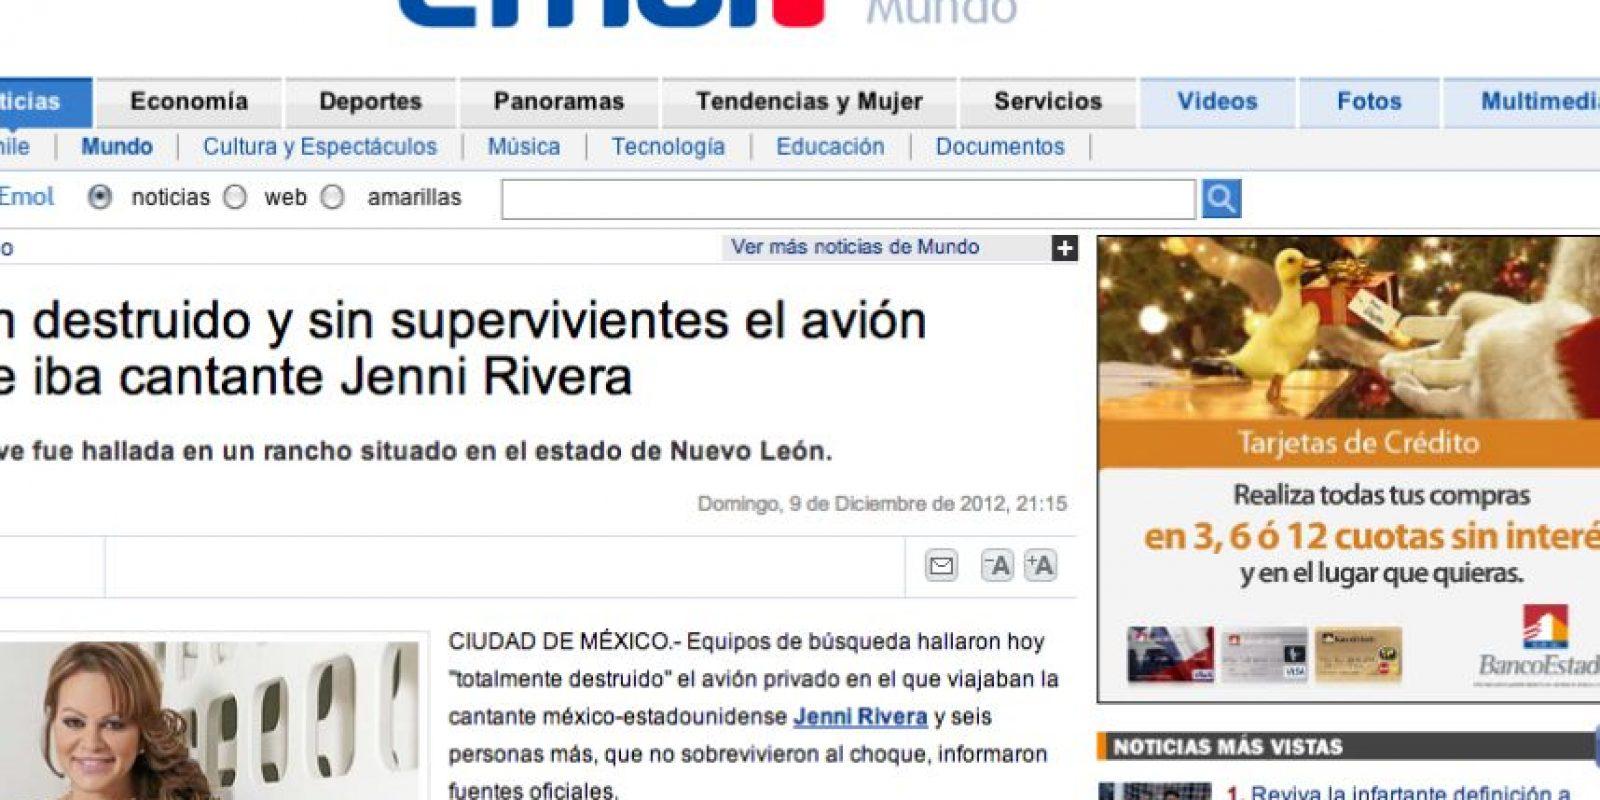 El Mercurio (Chile)